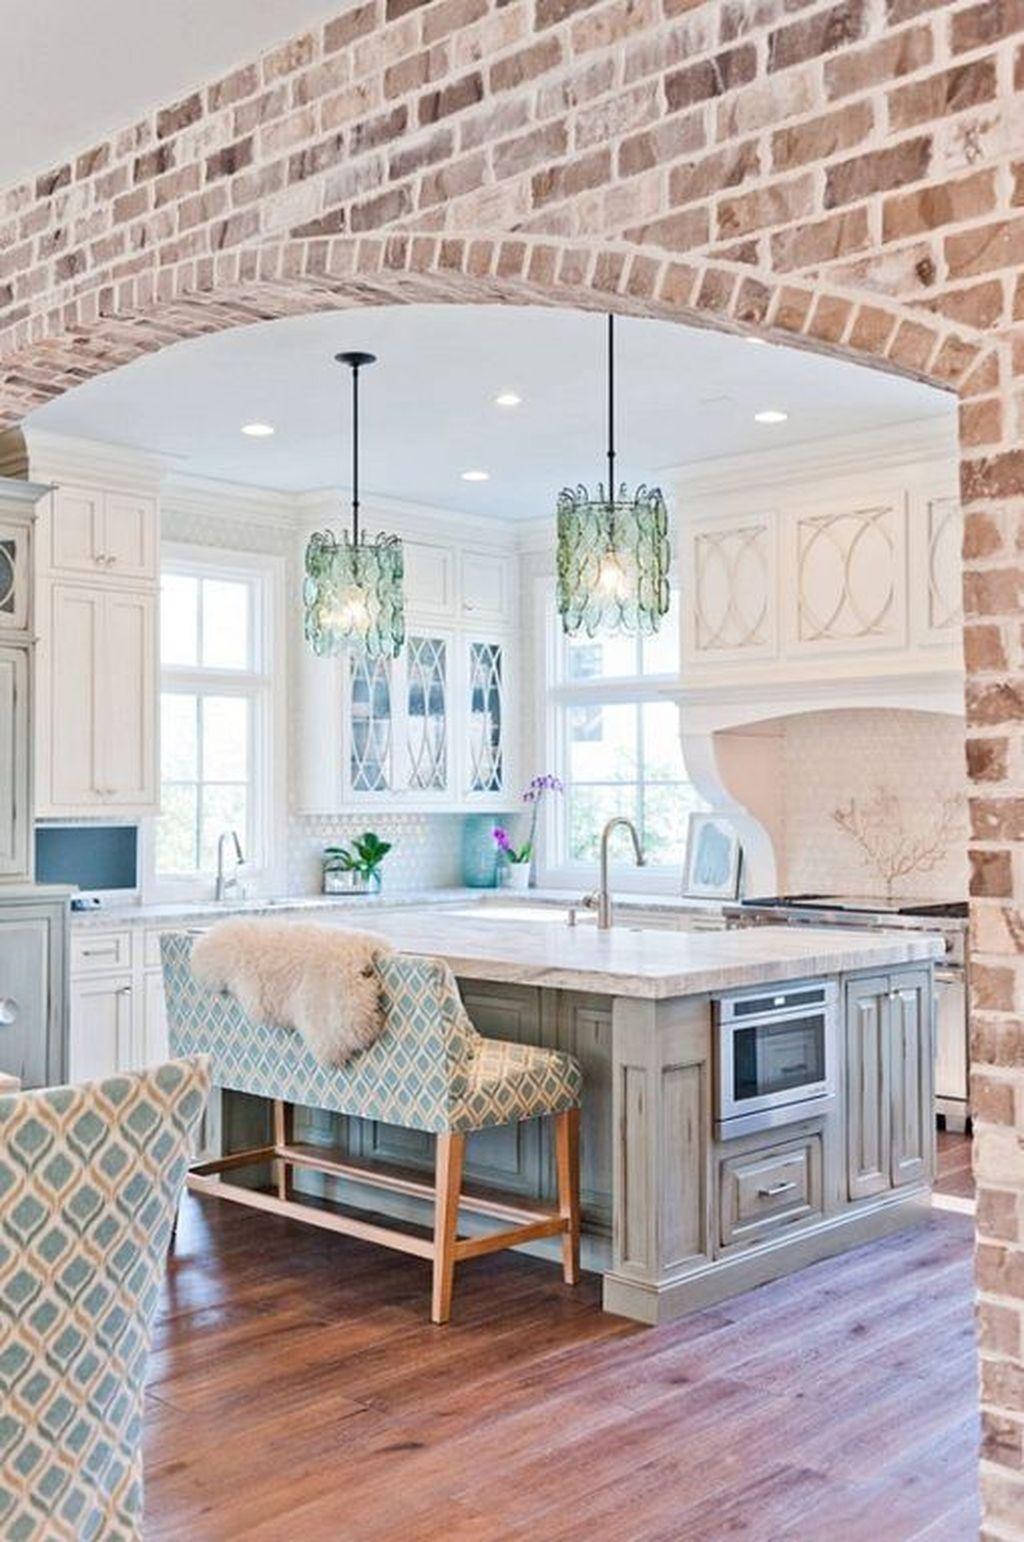 38 Gorgeous Farmhouse Kitchen Island Decor Ideas Popy Home Home Sweet Home House Of Turquoise